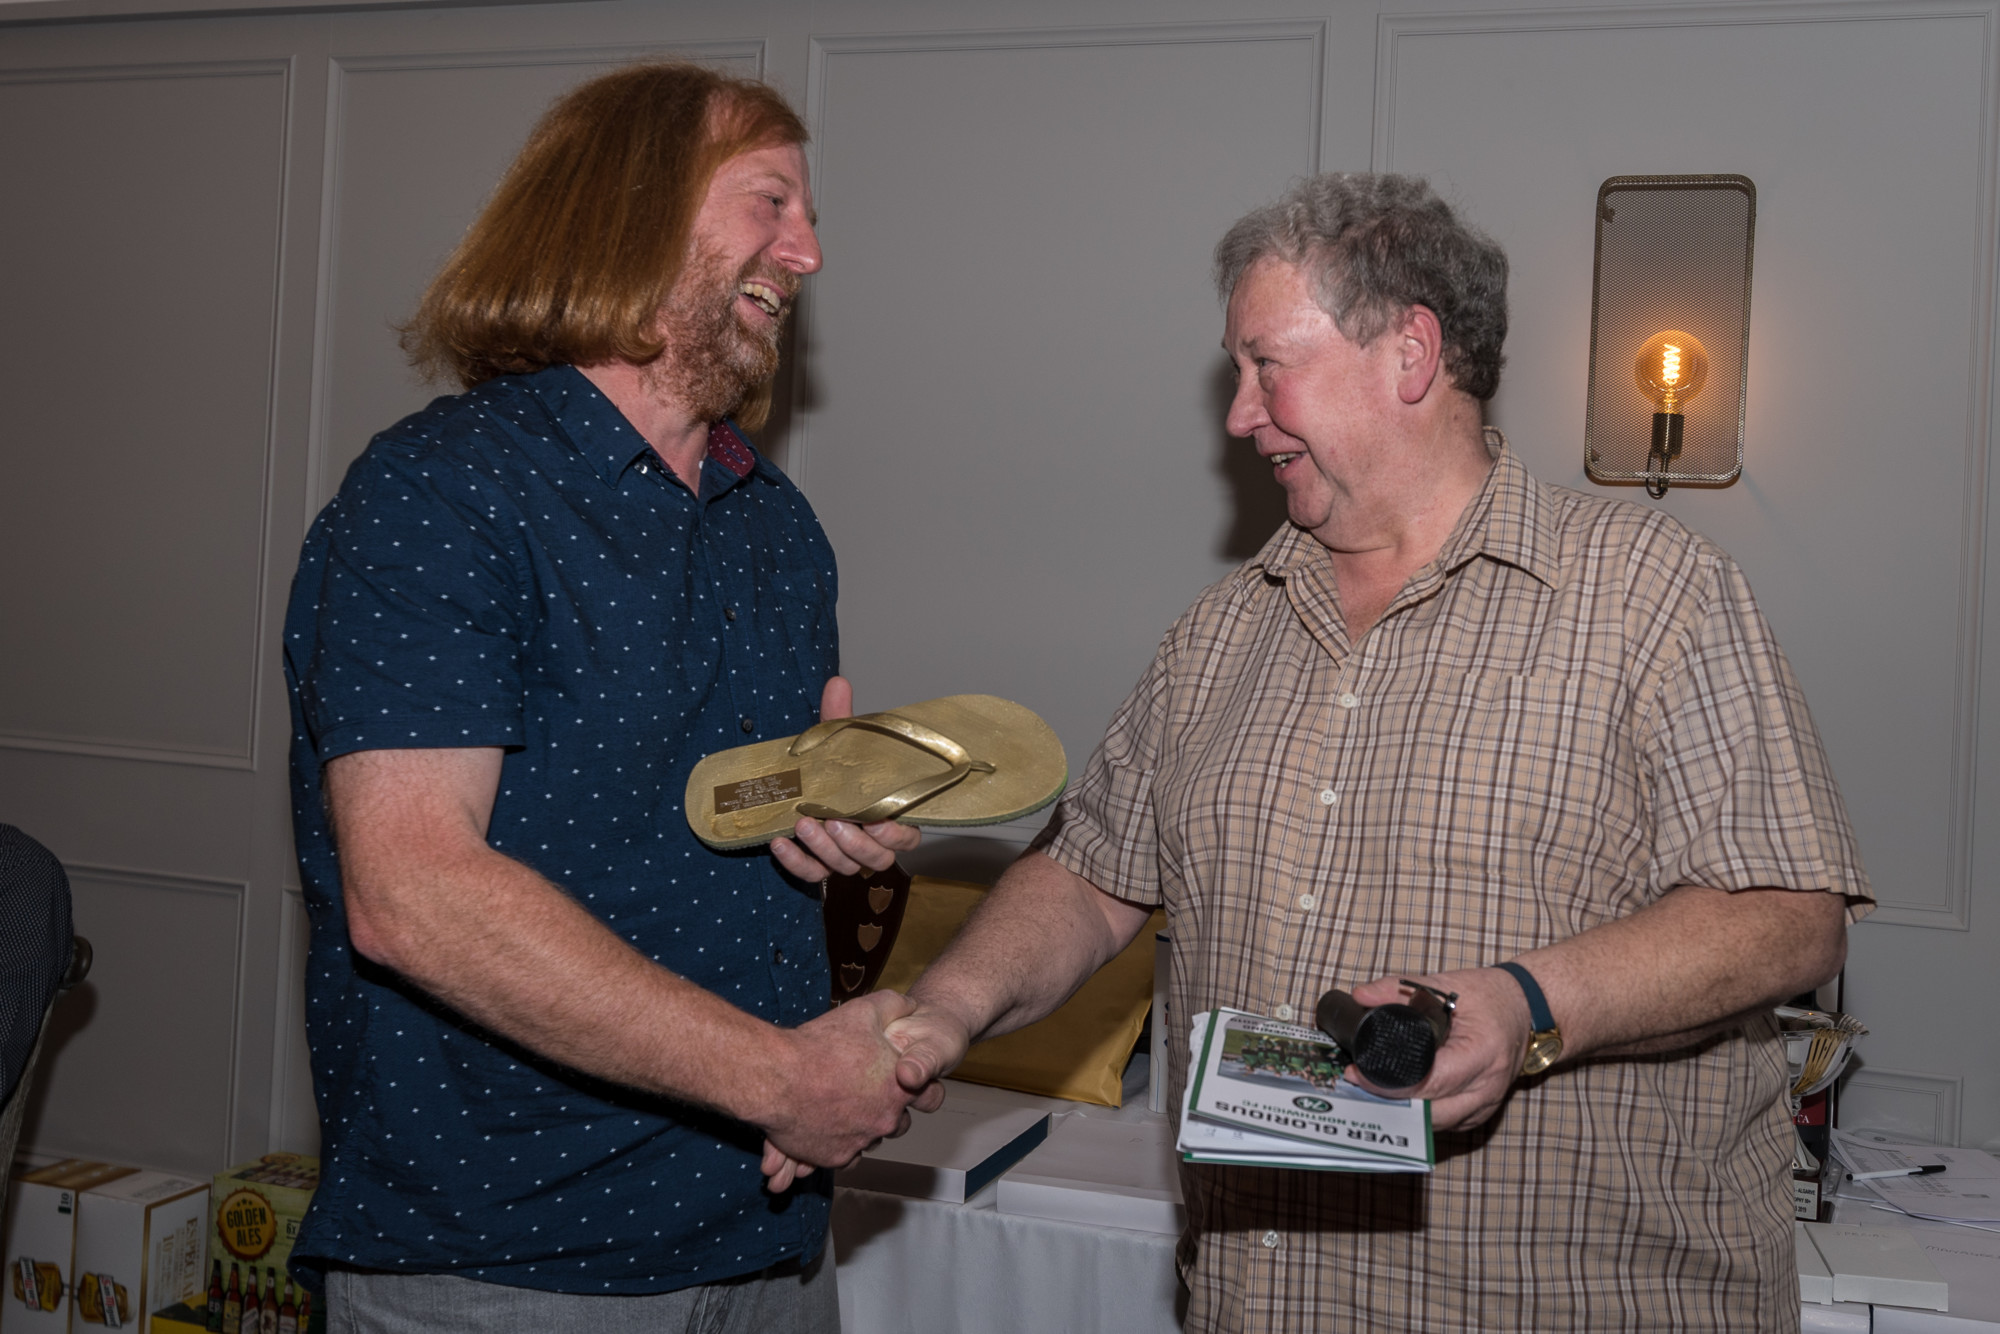 Phil Burgess - Golden Flip Flop winner